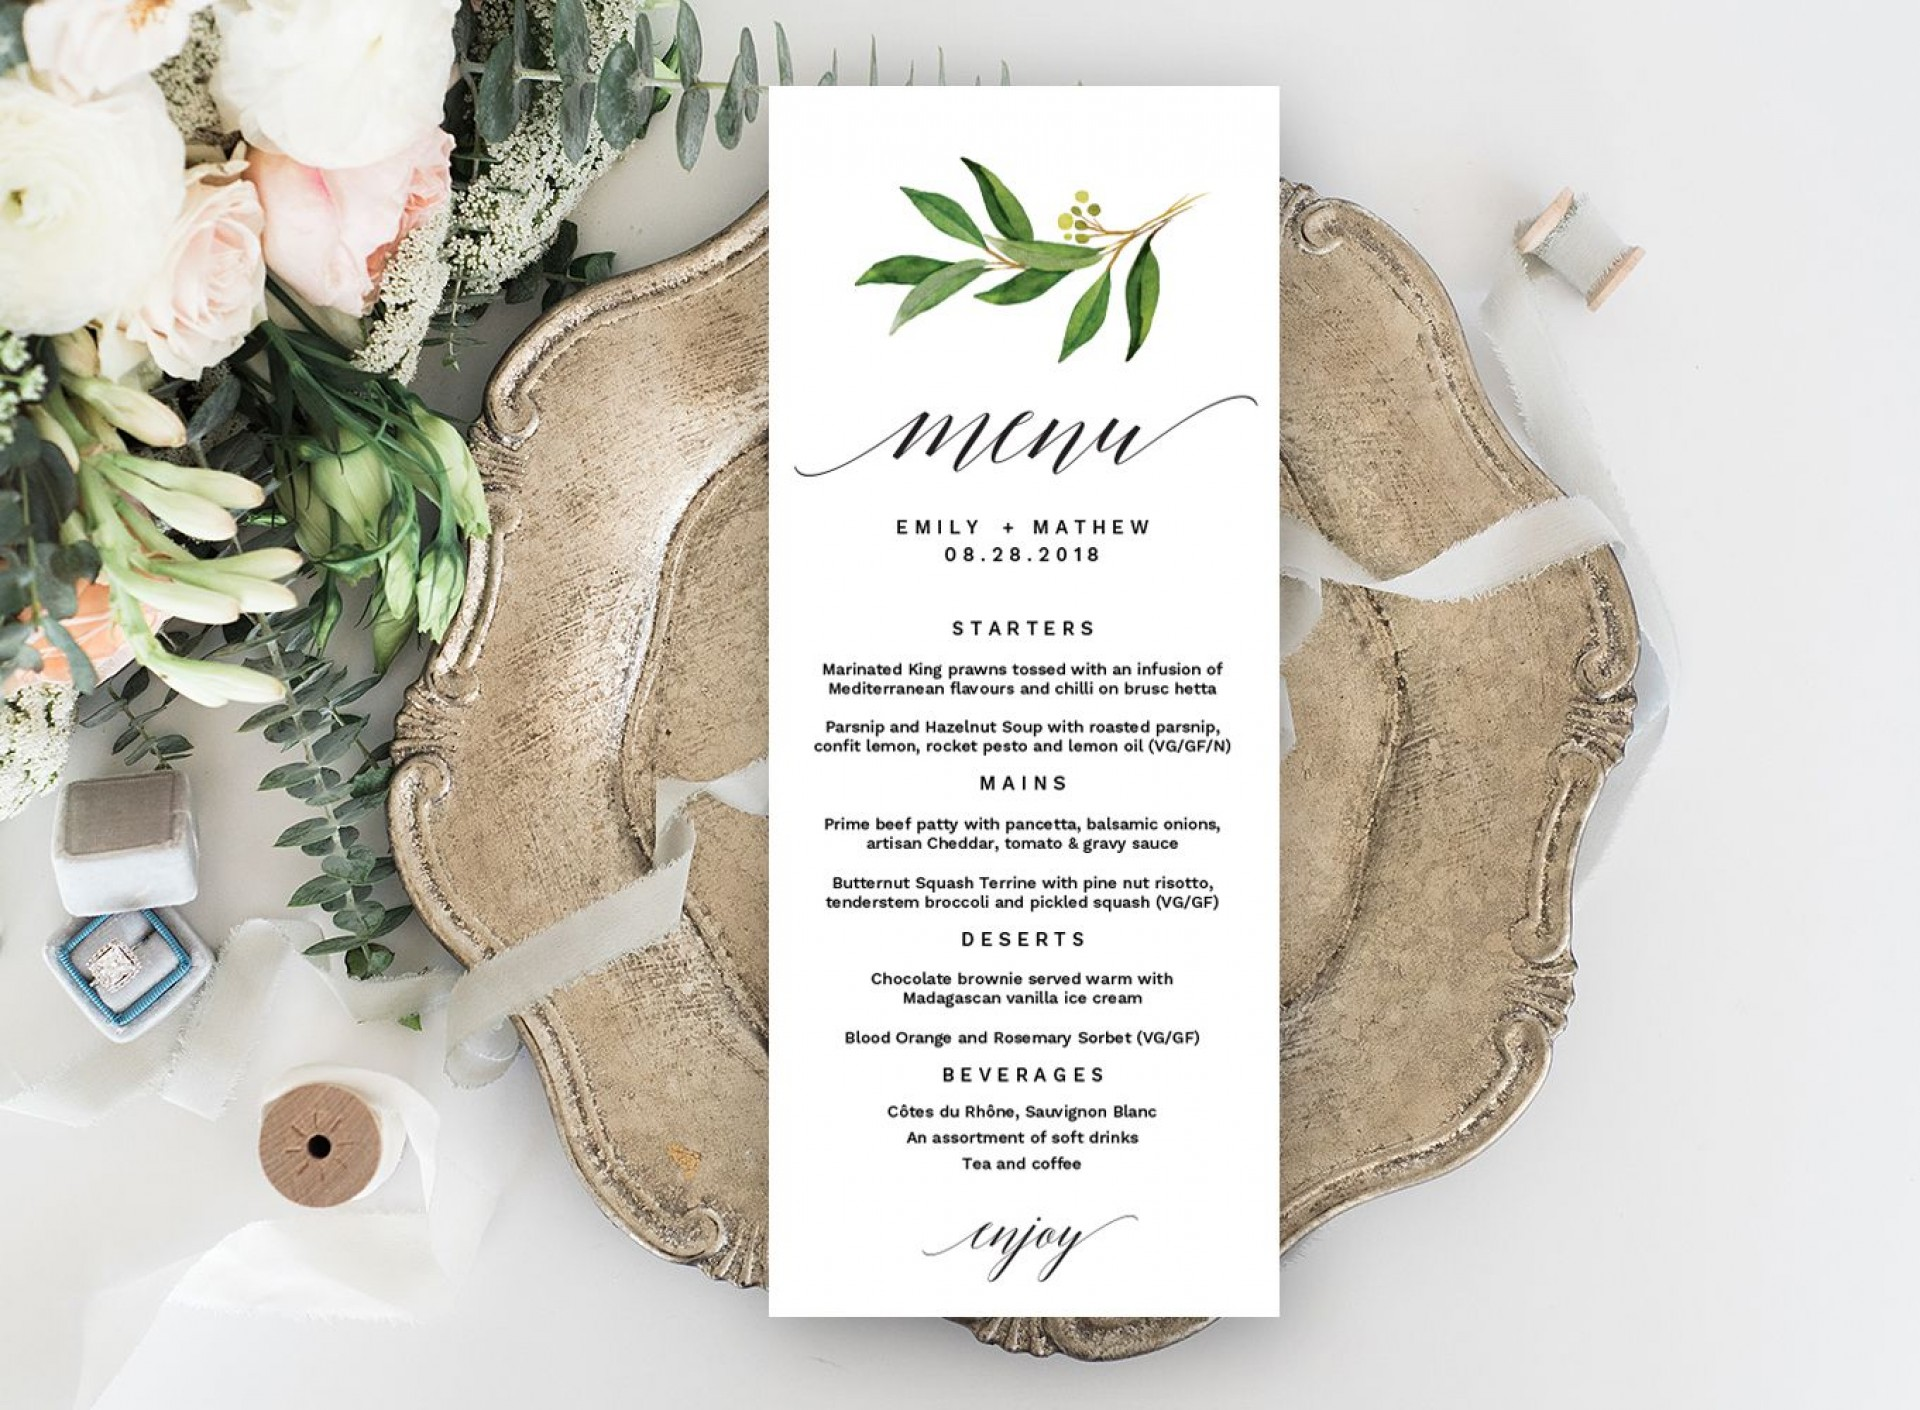 004 Astounding Free Printable Wedding Menu Card Template Picture  Templates1920